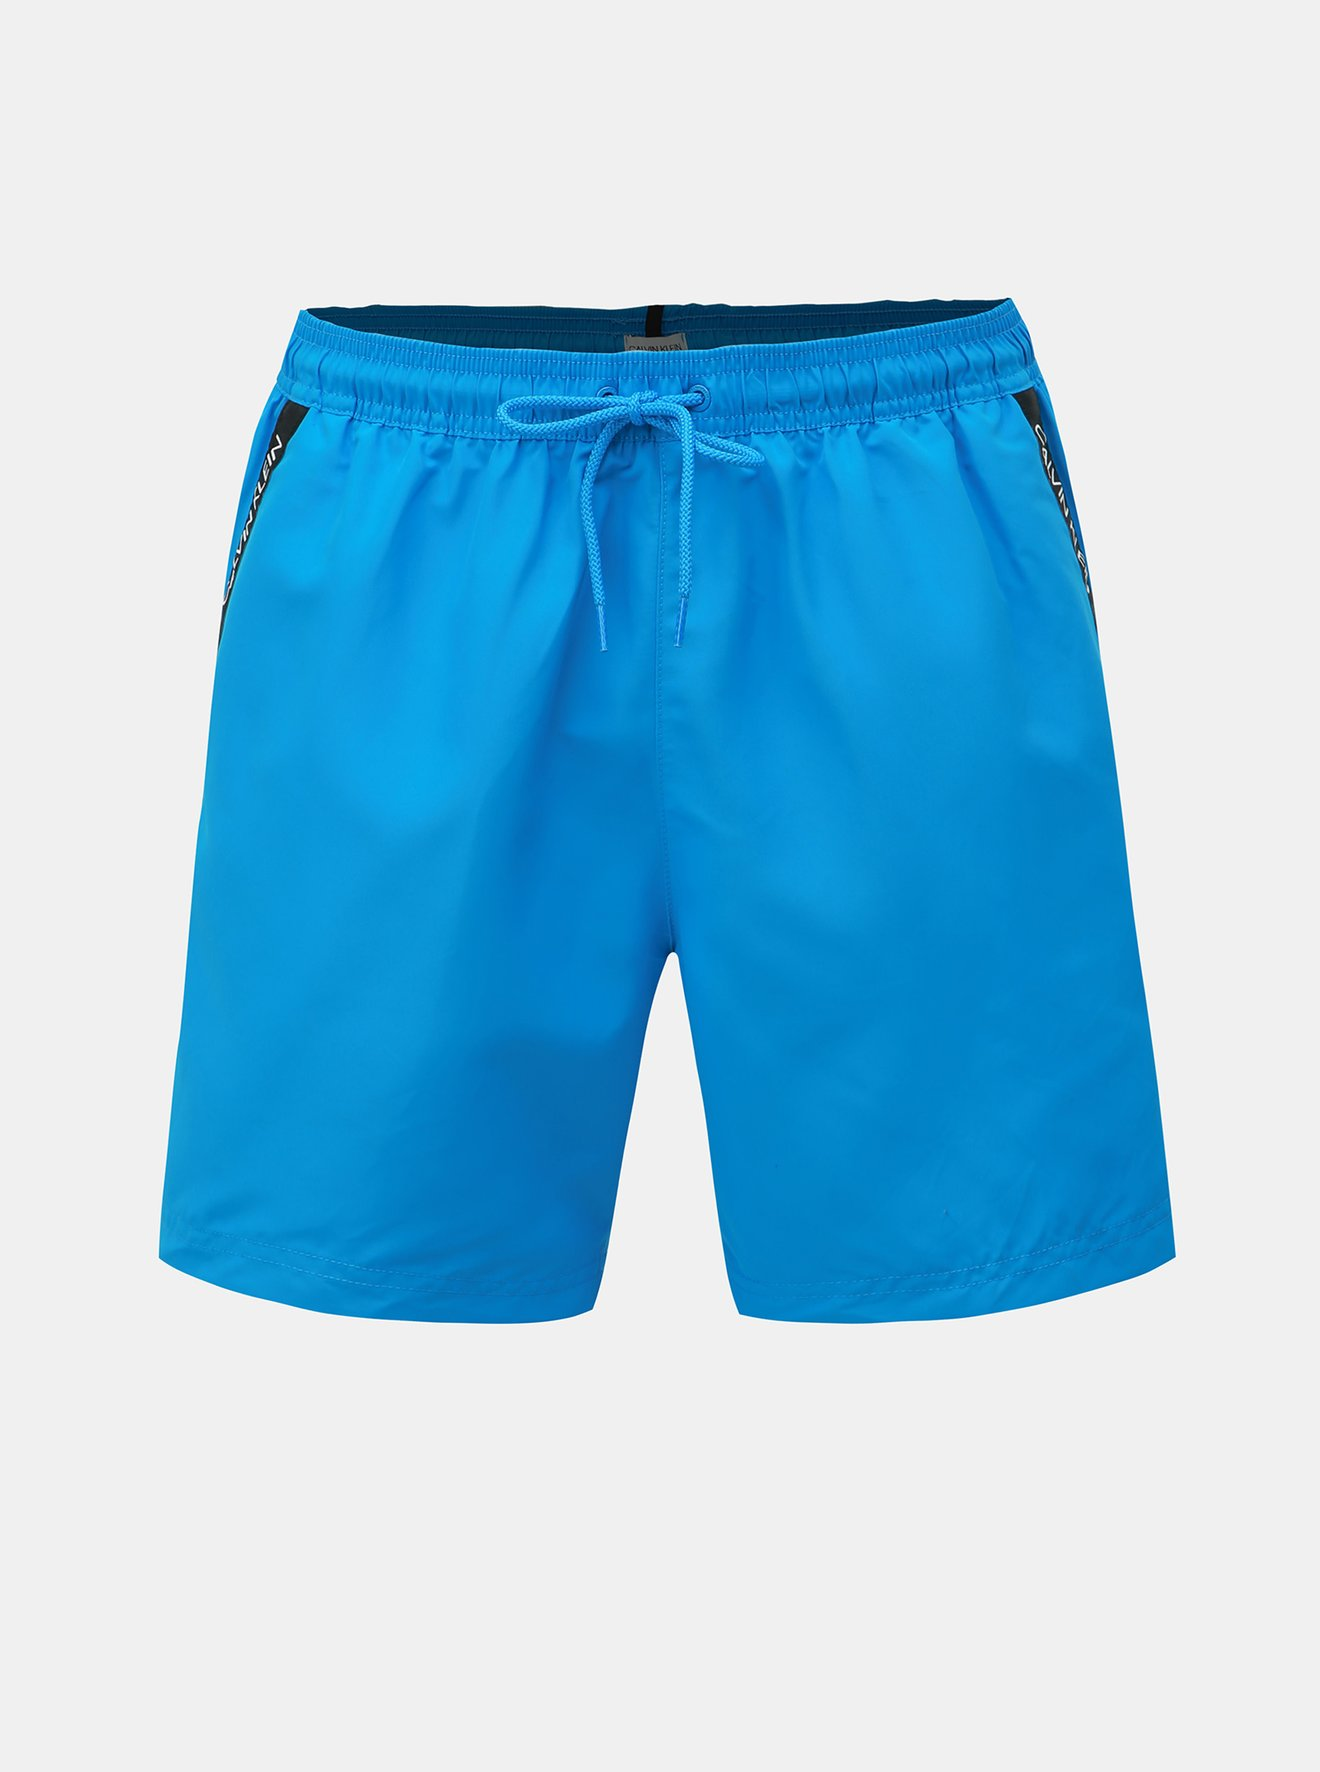 Modré pánské plavky Calvin Klein Underwear